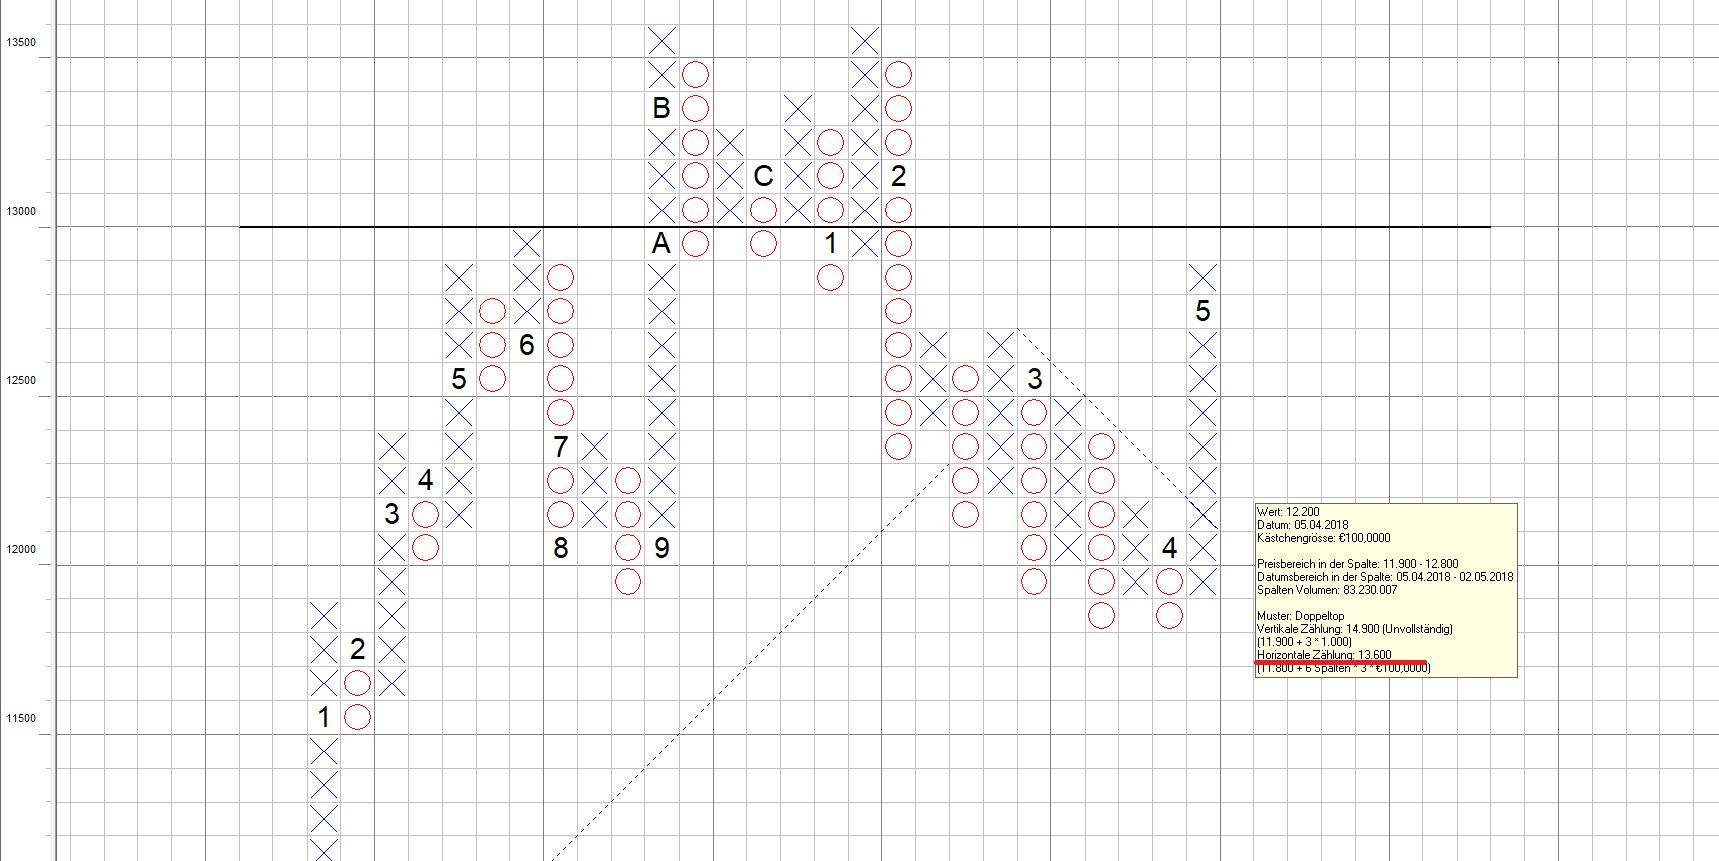 DAX hält Kursziel weiter aufrecht - Ableitung aus Point and Figure